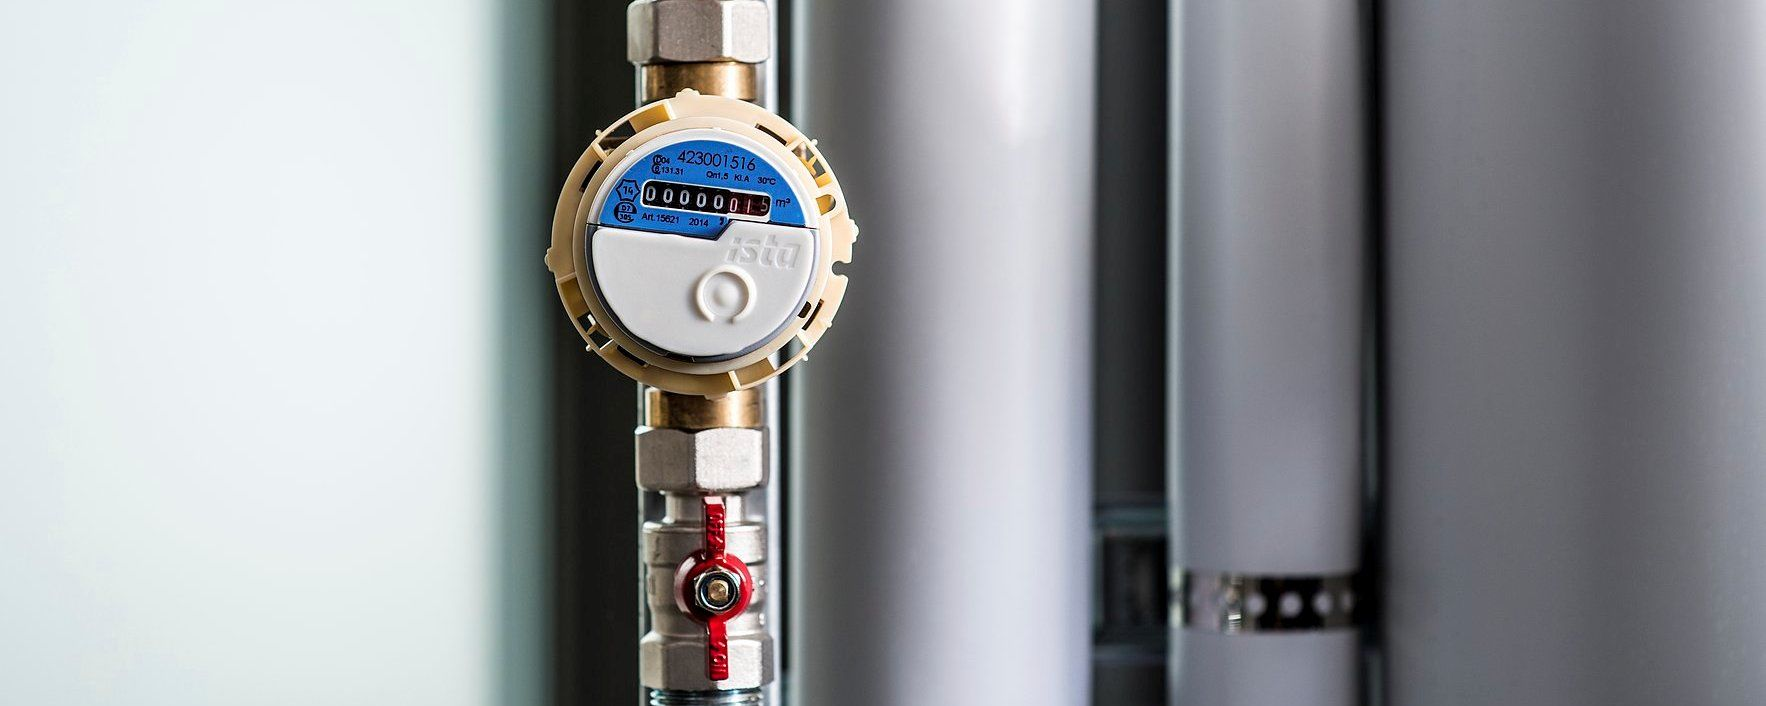 merac vody